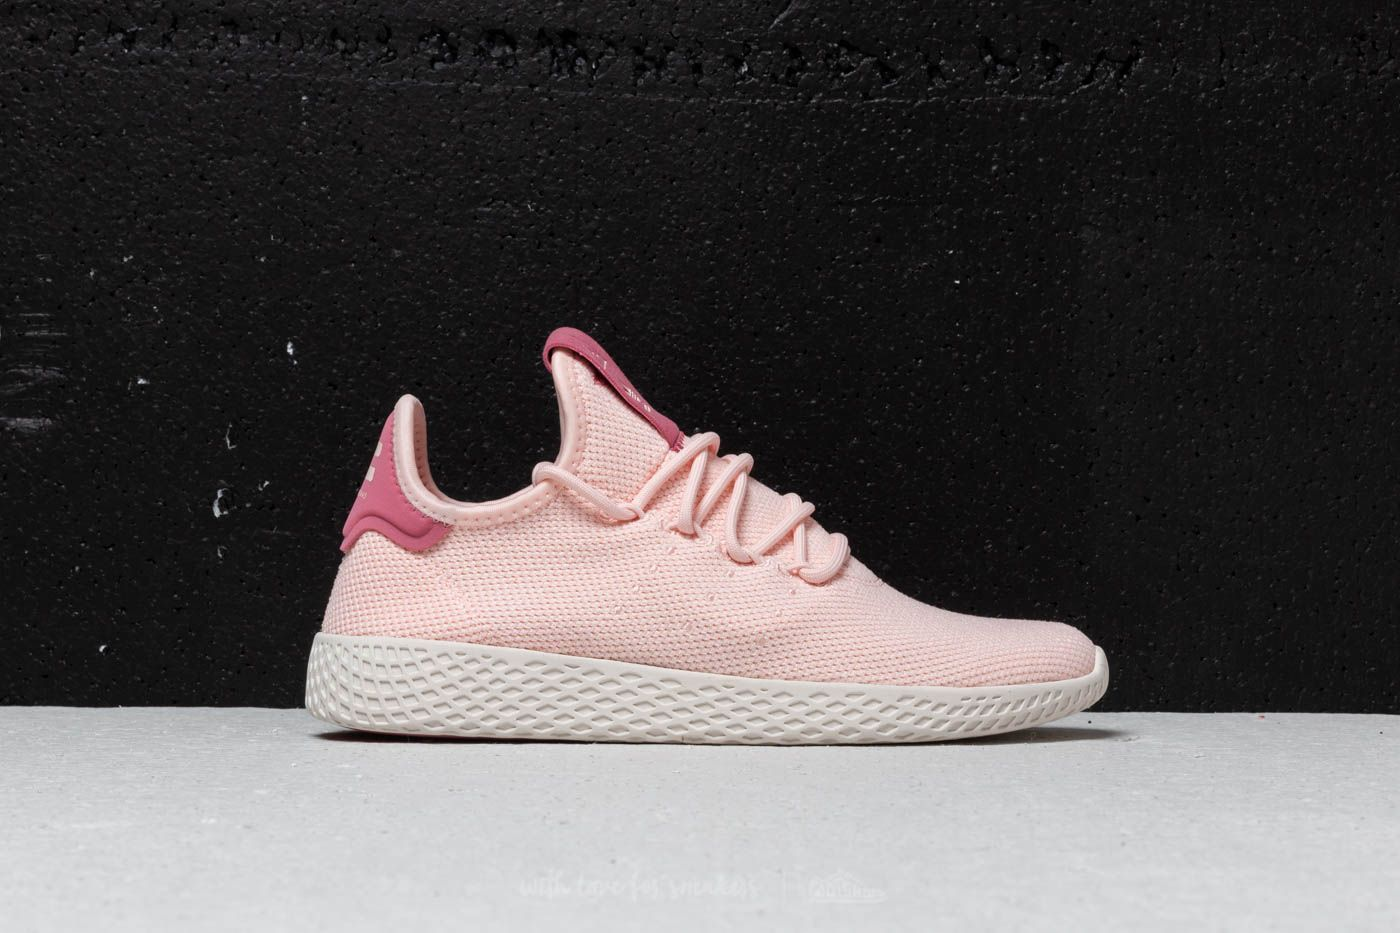 e473b5ddbe2ac adidas x Pharrell Williams Tennis HU W Icey Pink  Icey Pink  Chalk ...